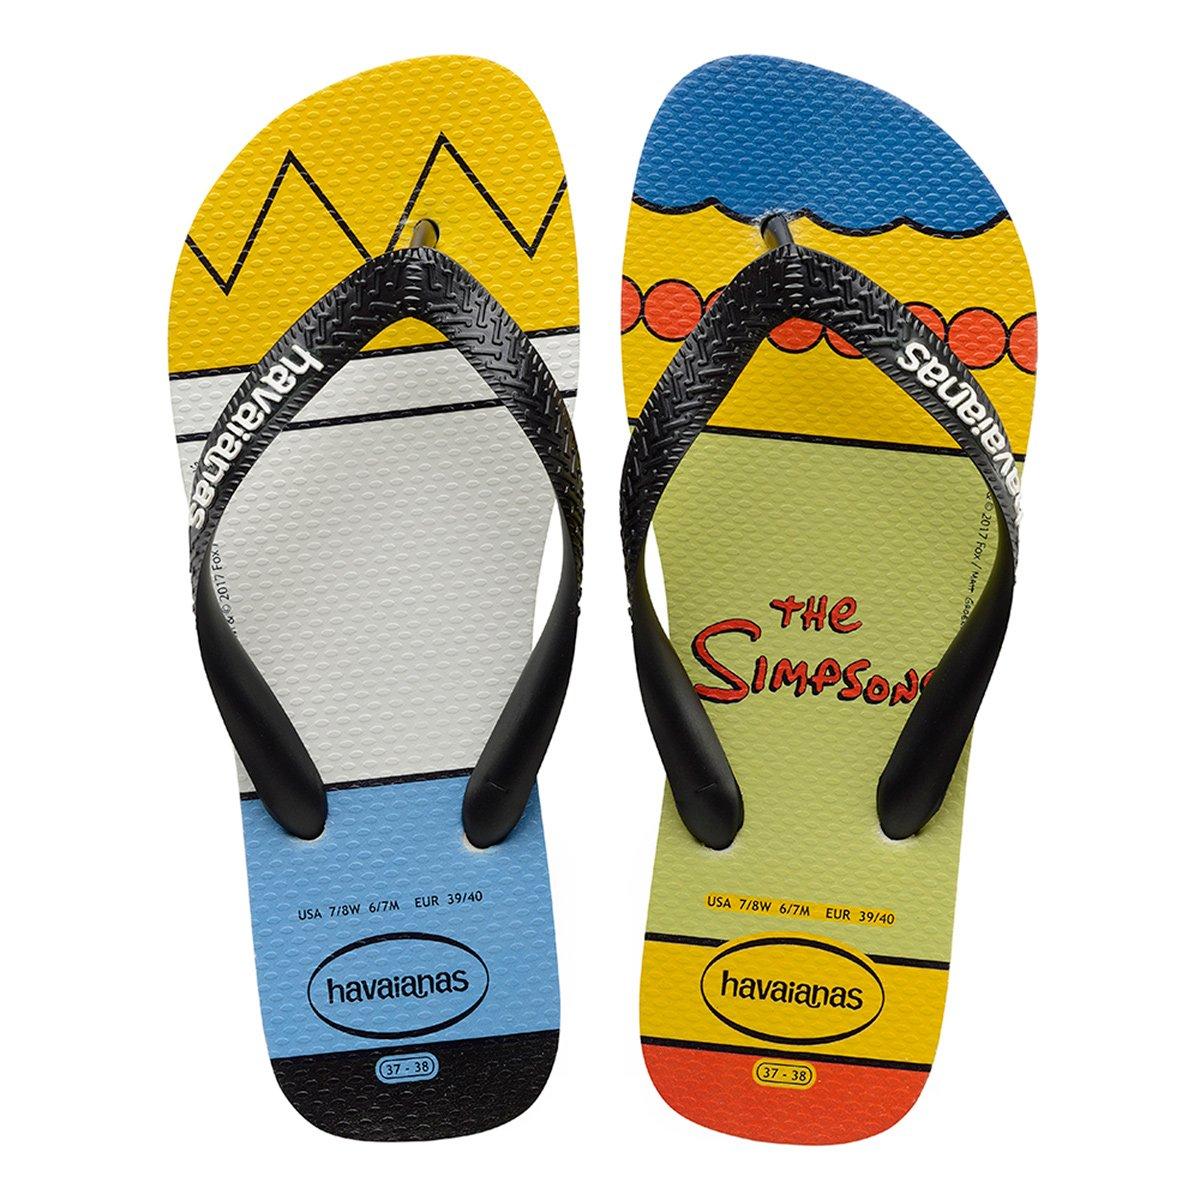 Sandália Havaianas Simpsons - Compre Agora  b72cf435b7c